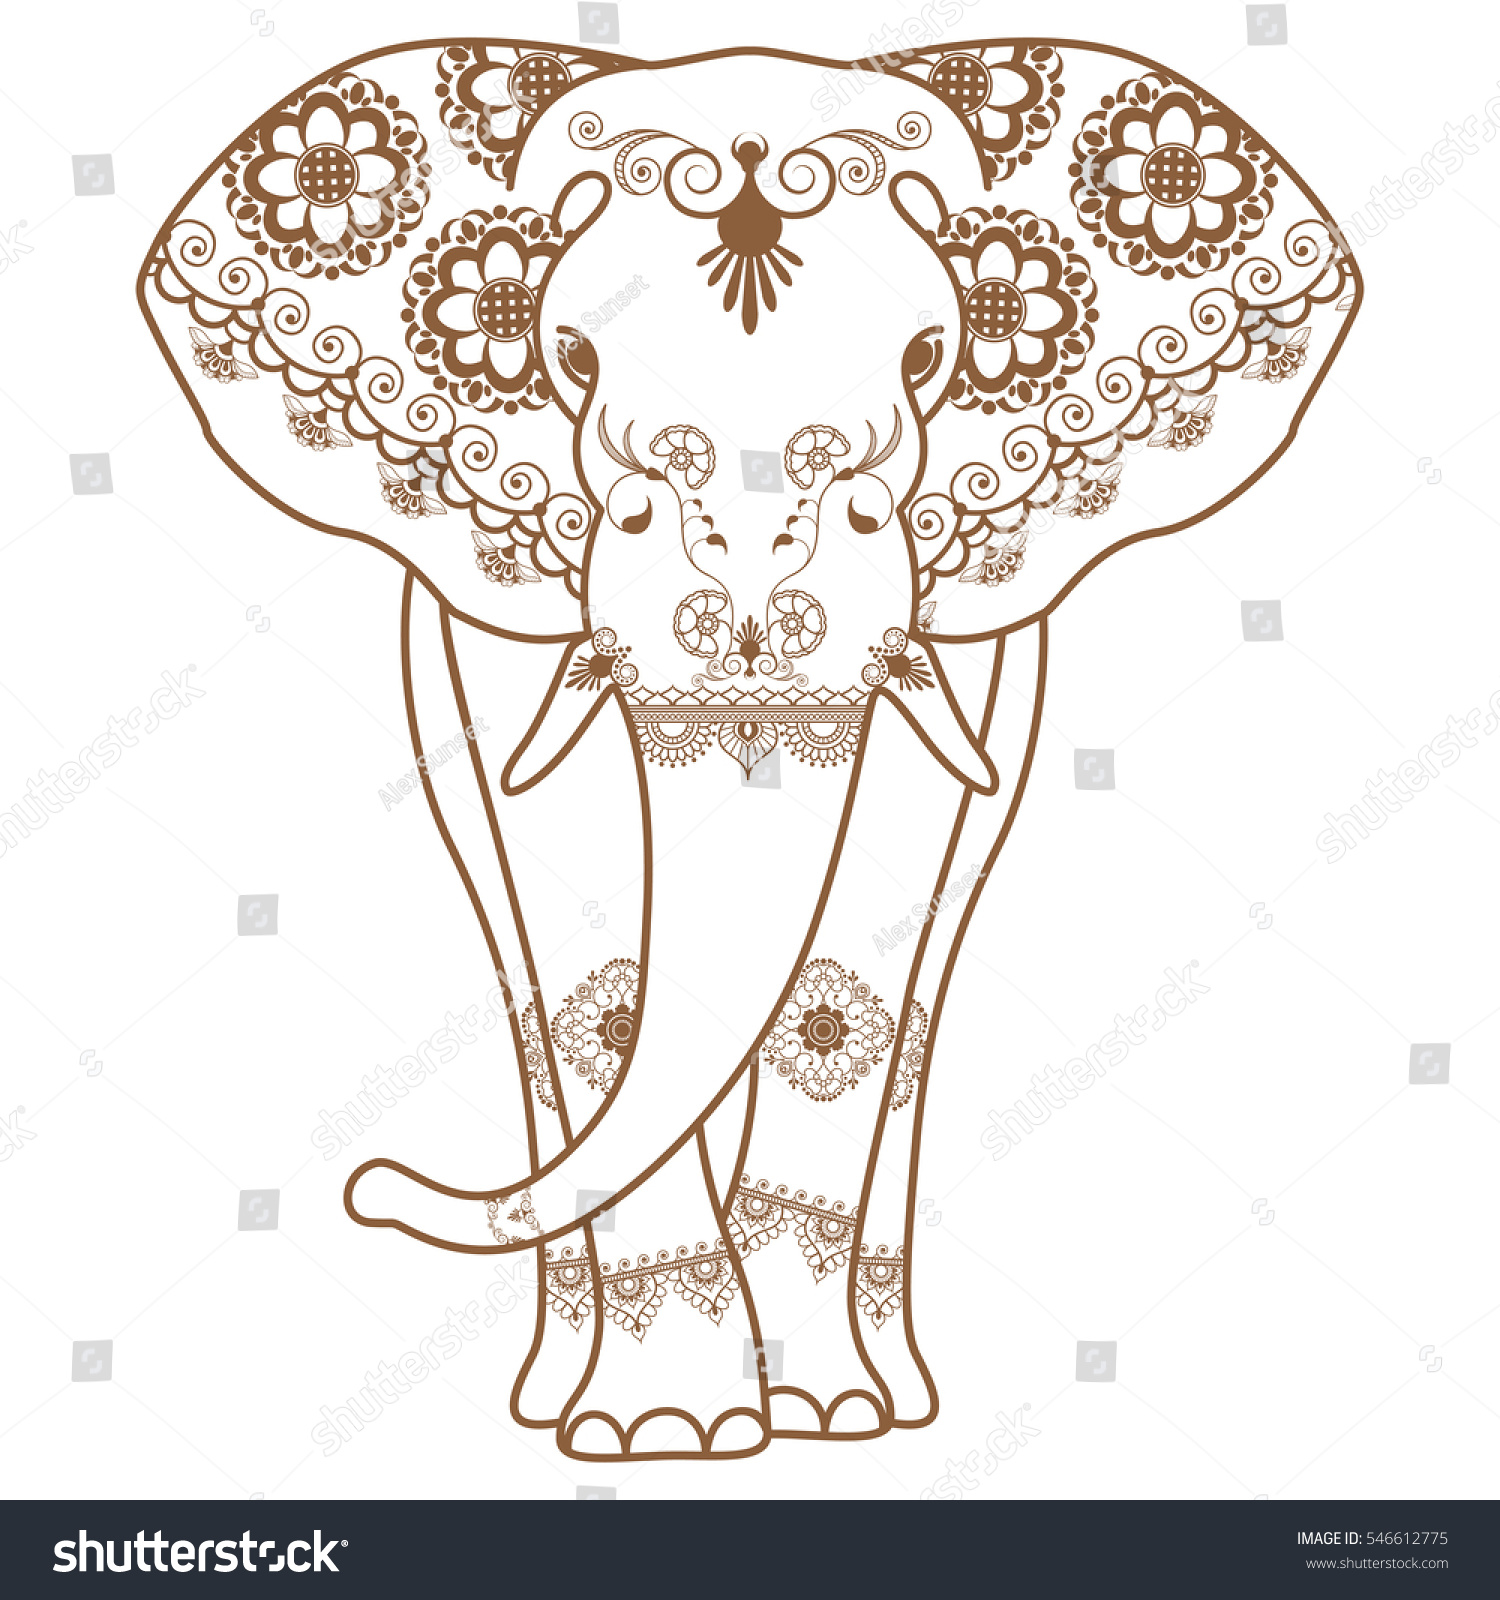 Henna Elephant Tattoo Designs: Mehndi Tattoo Brown Henna Elephant Decorated Stock Vector